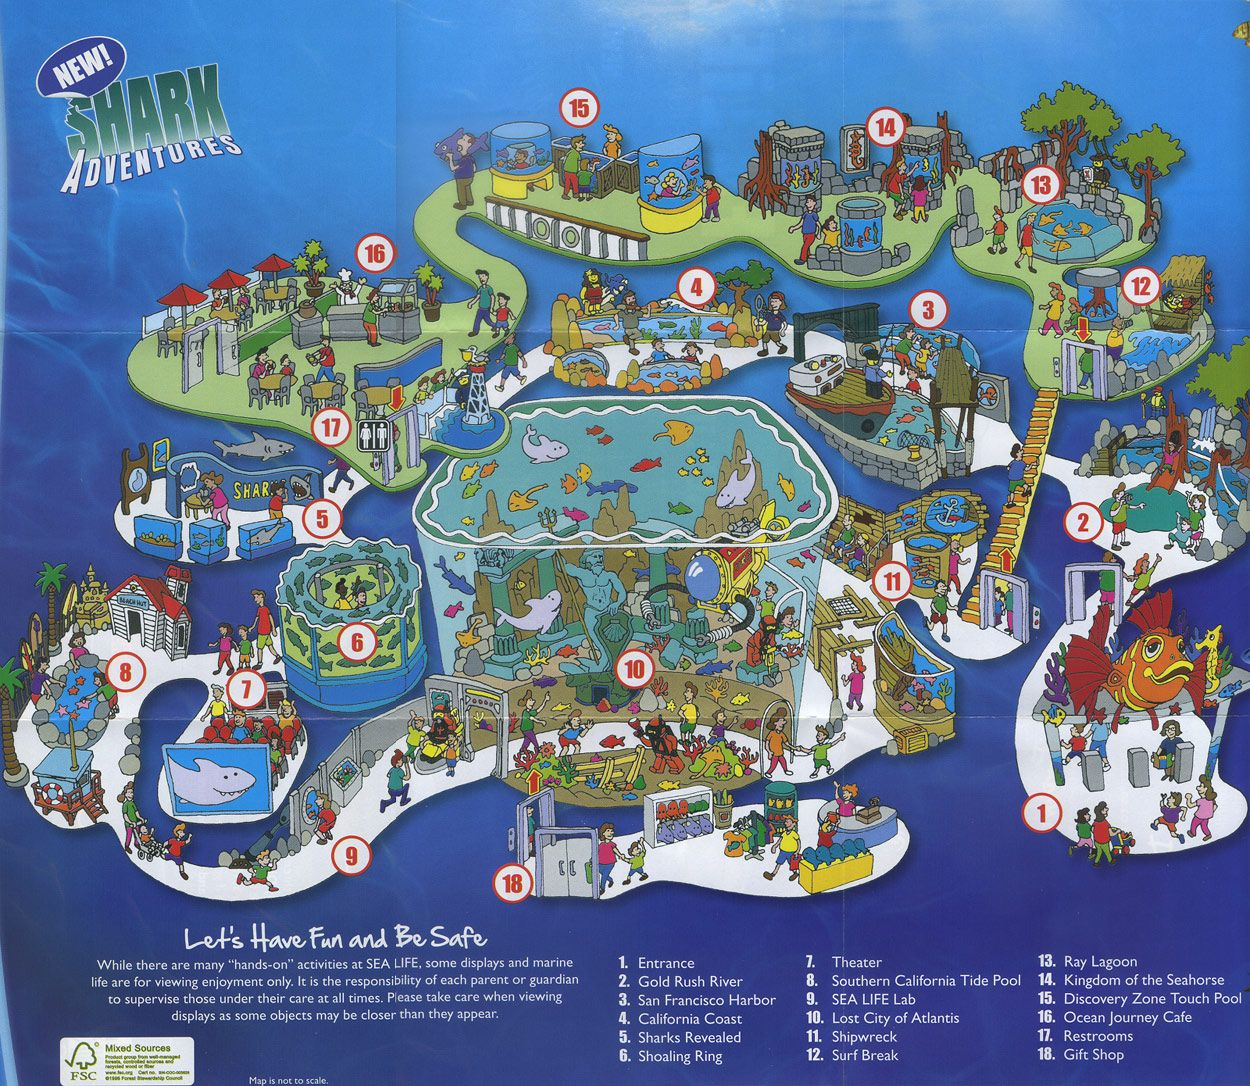 Sea Life Aquarium 2011 Map Maps Map Map Diagram Maps For Kids